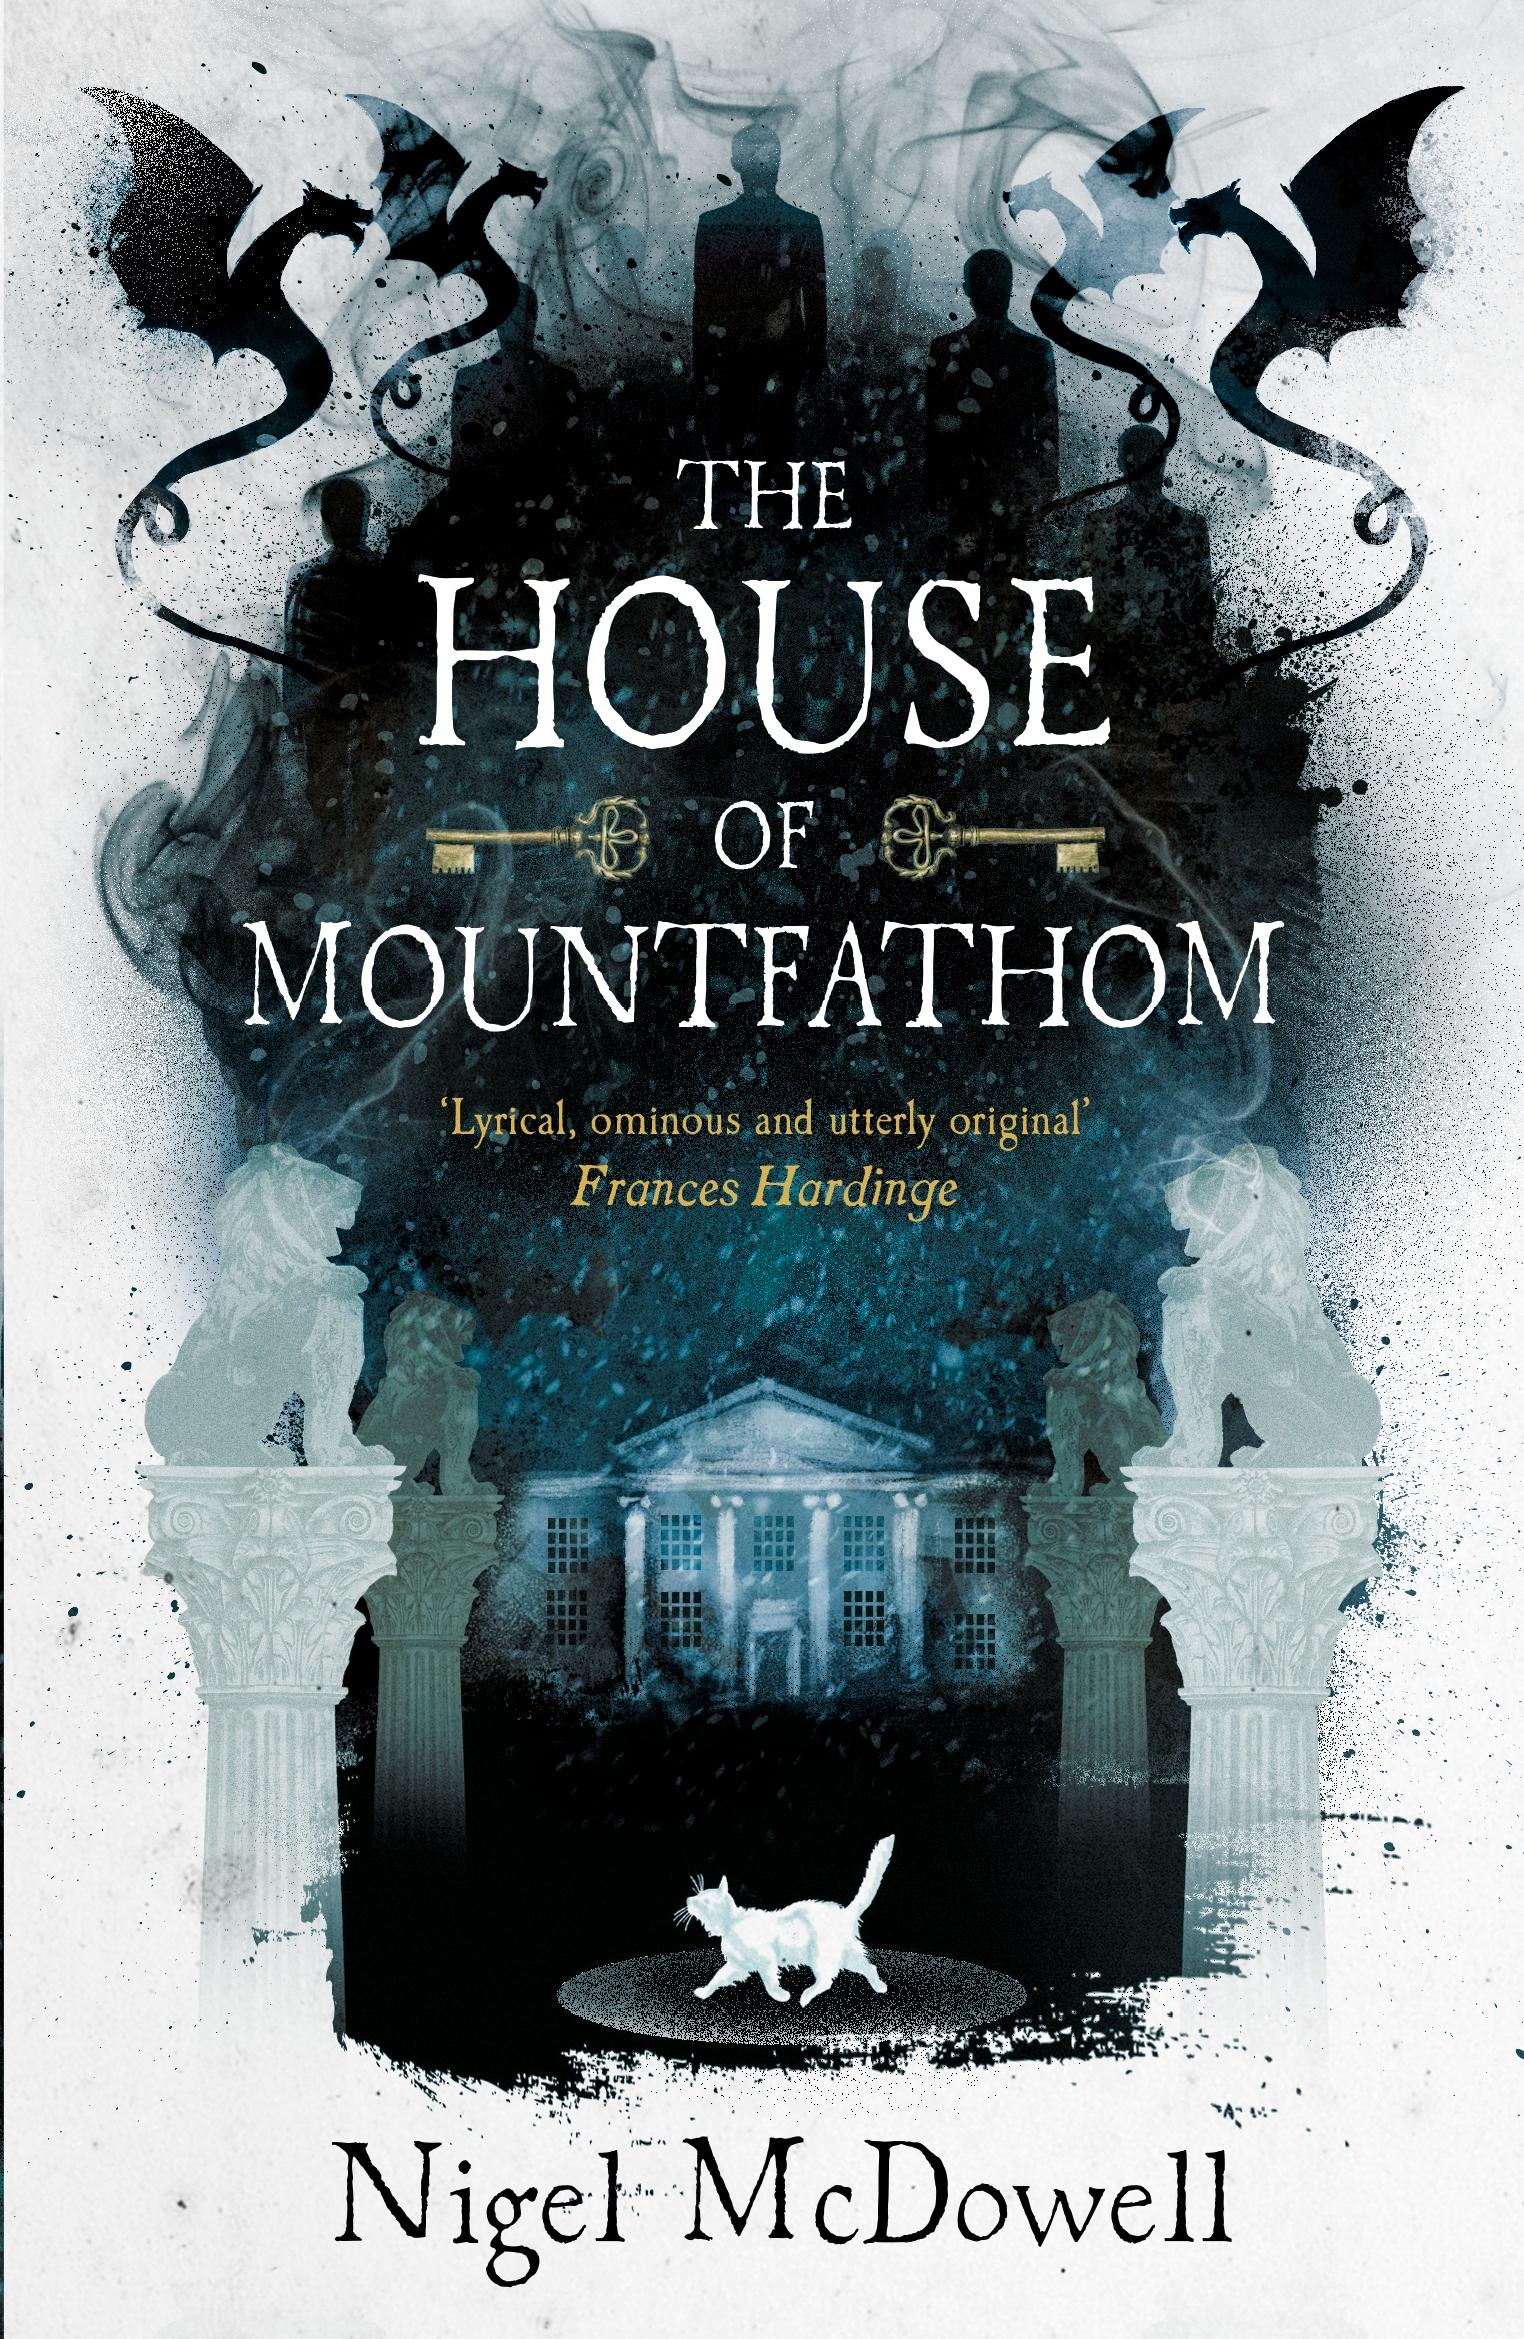 The House of Mountfathom by Nigel McDowell